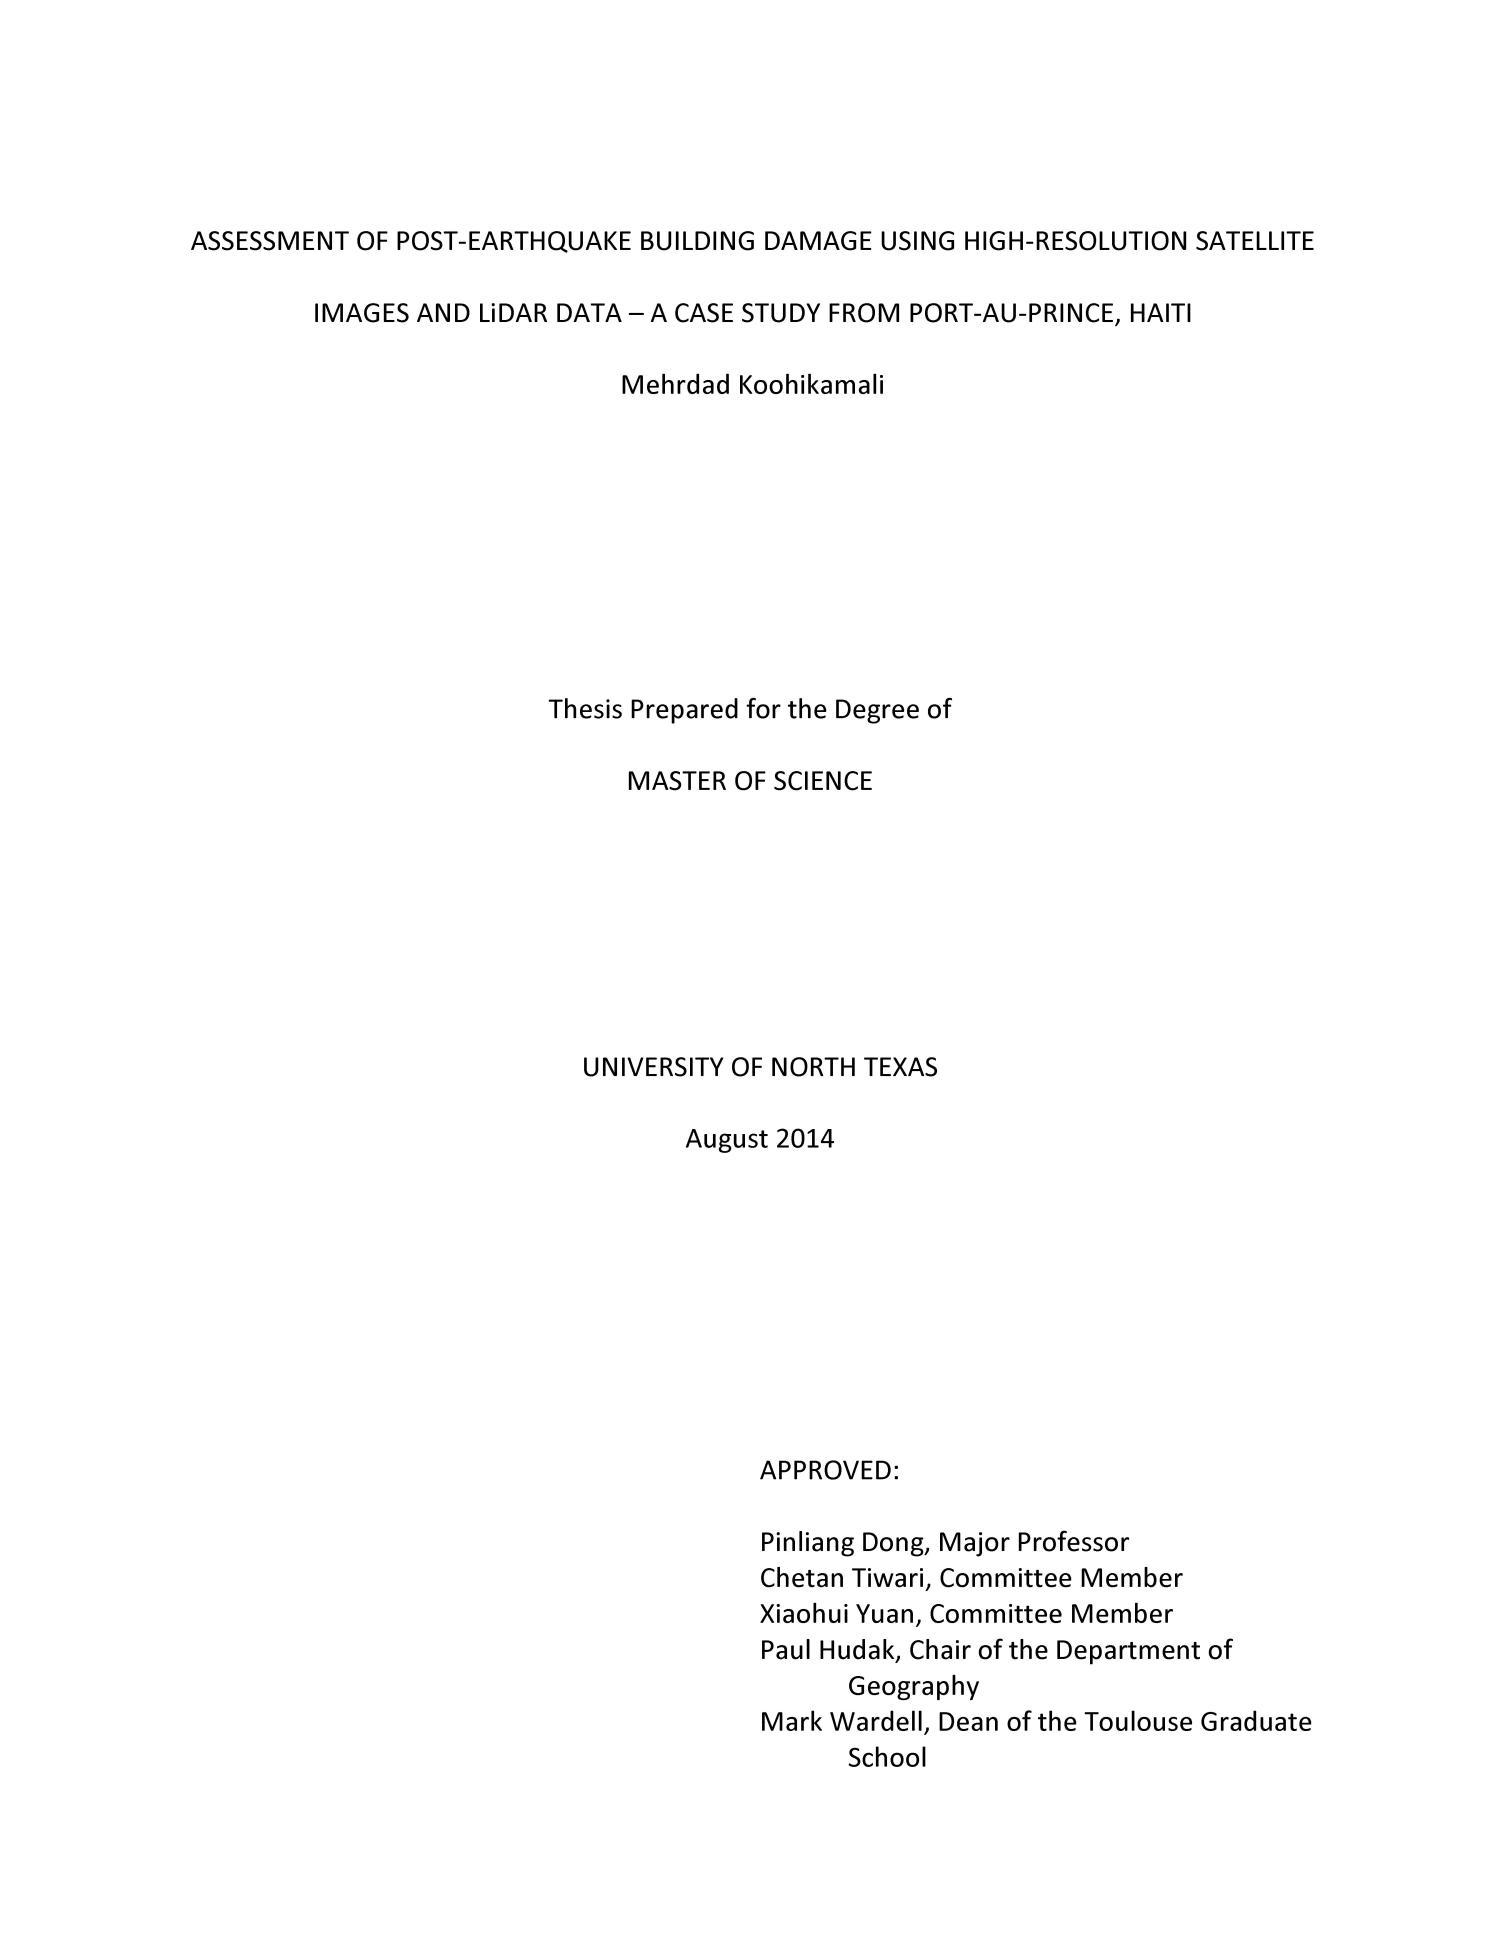 Haiti earthquake thesis popular argumentative essay writing websites uk